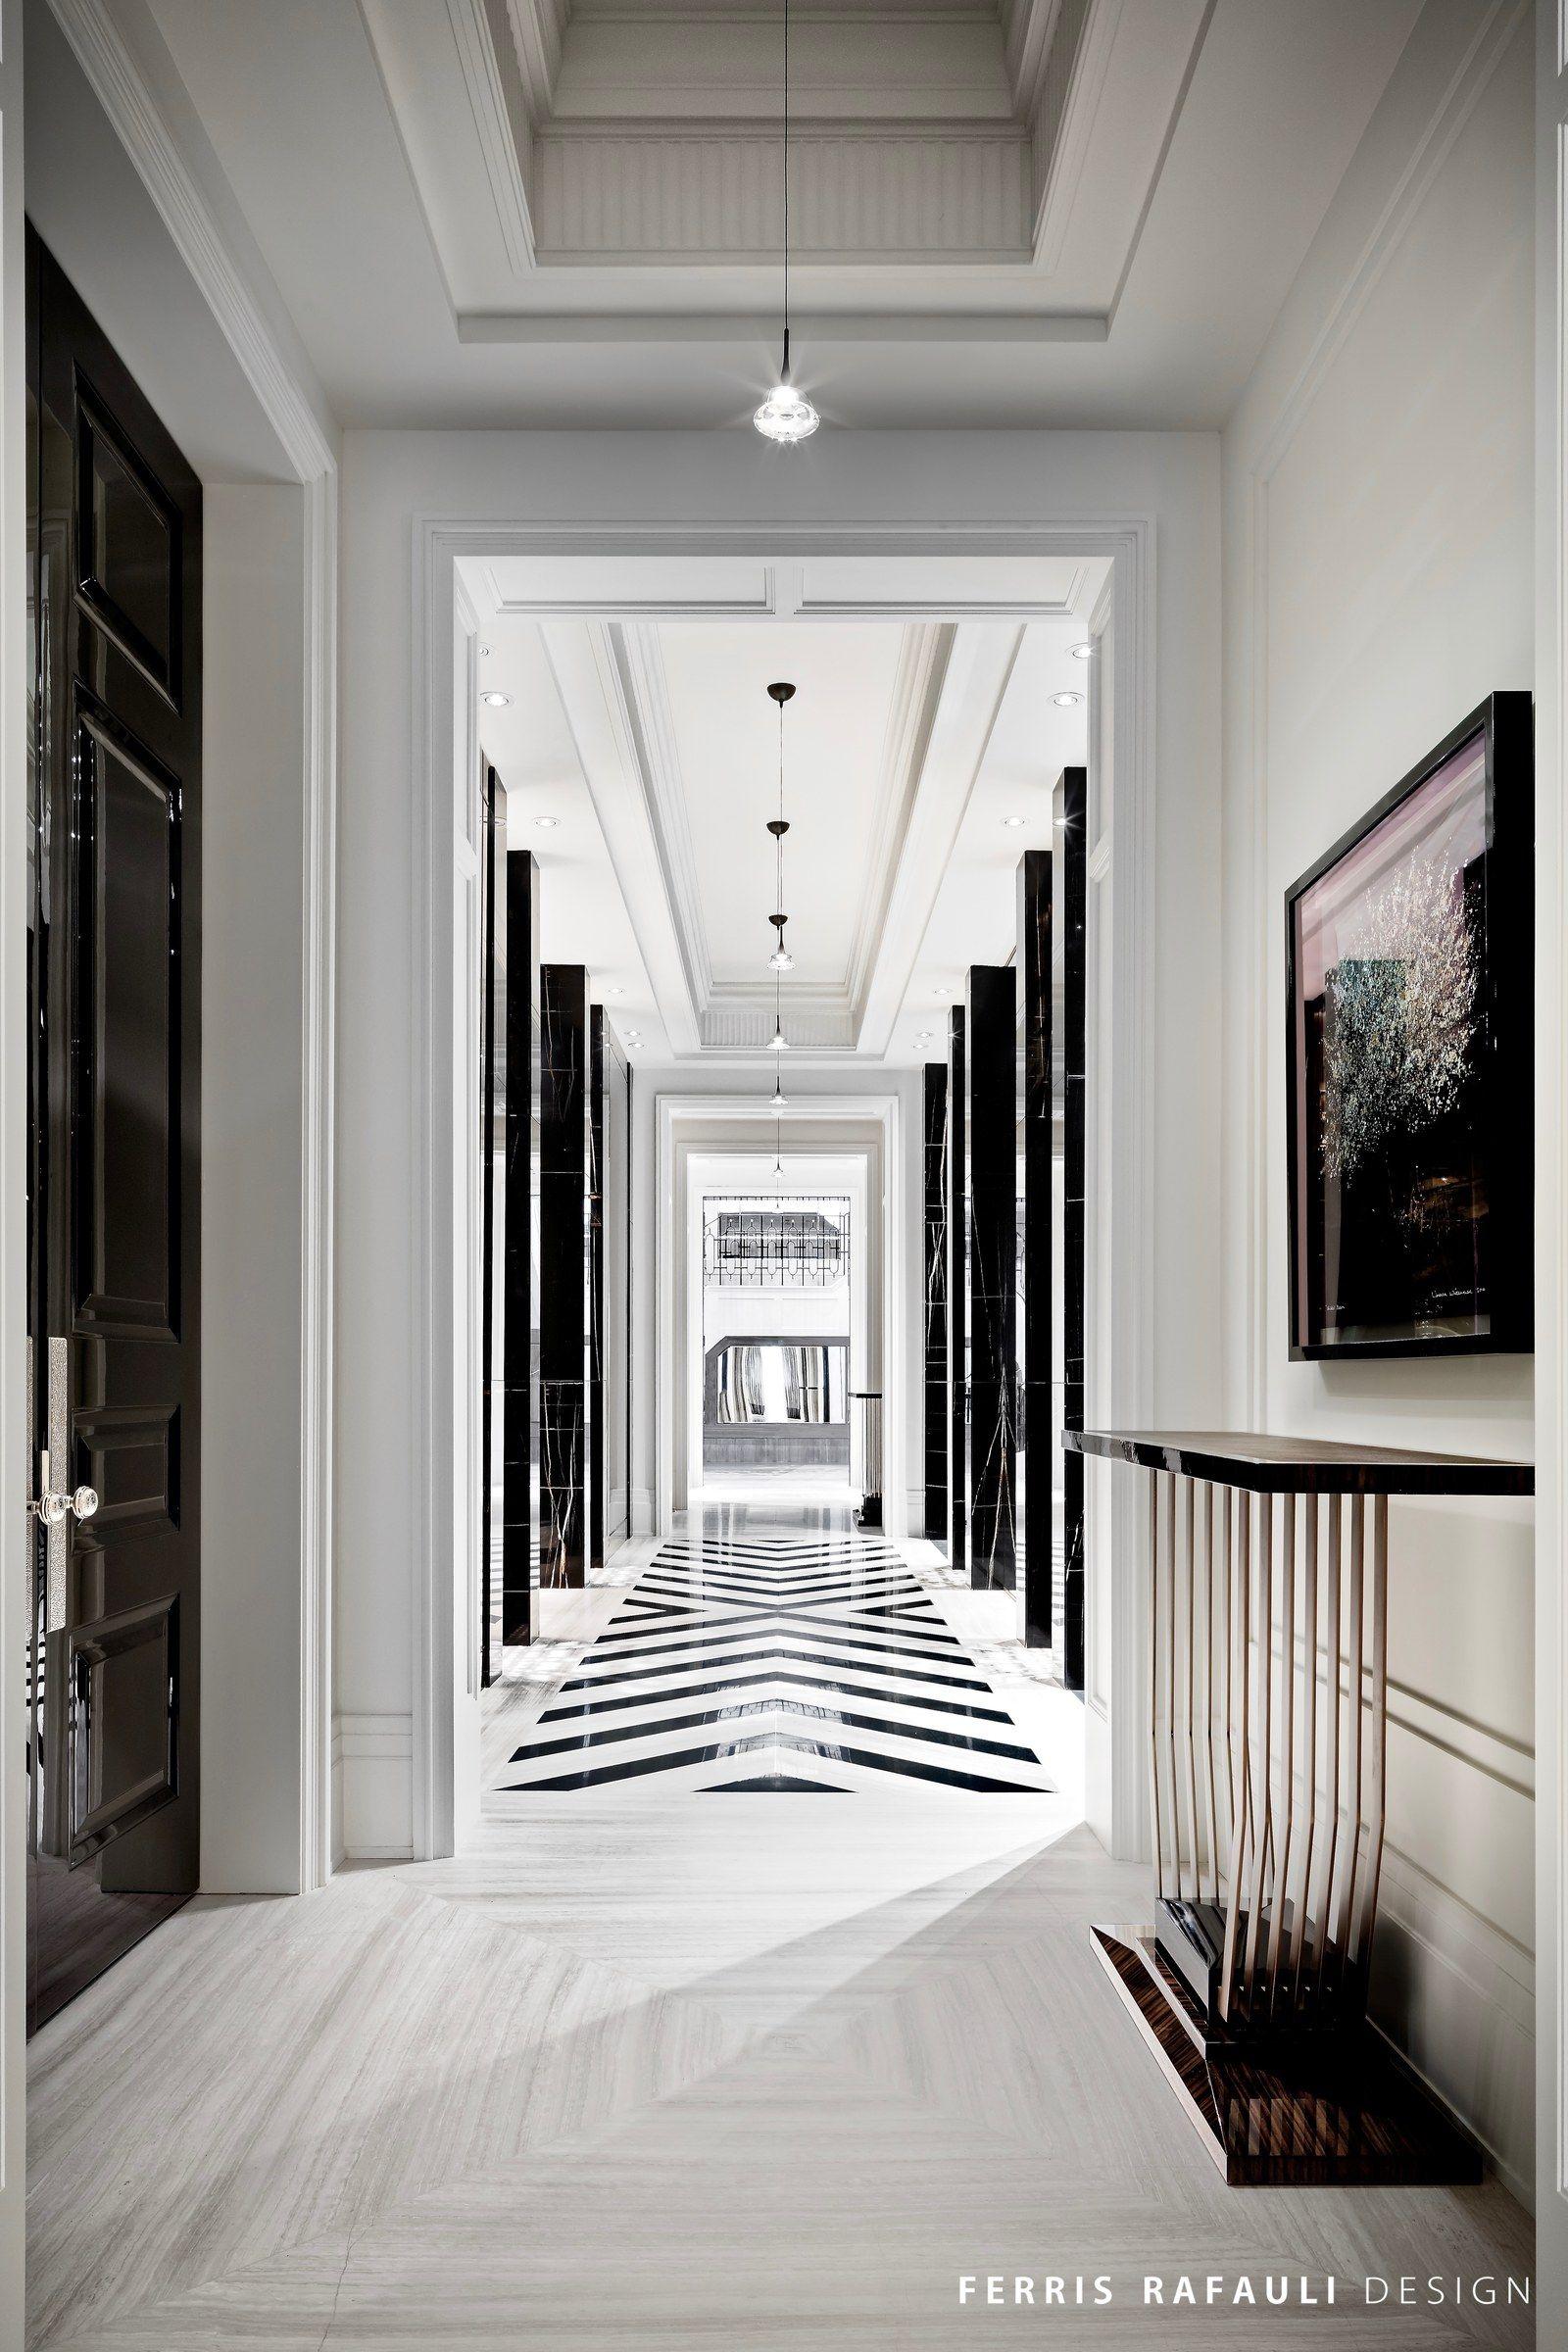 ferris rafauli architecture by ferris rafauli. Black Bedroom Furniture Sets. Home Design Ideas